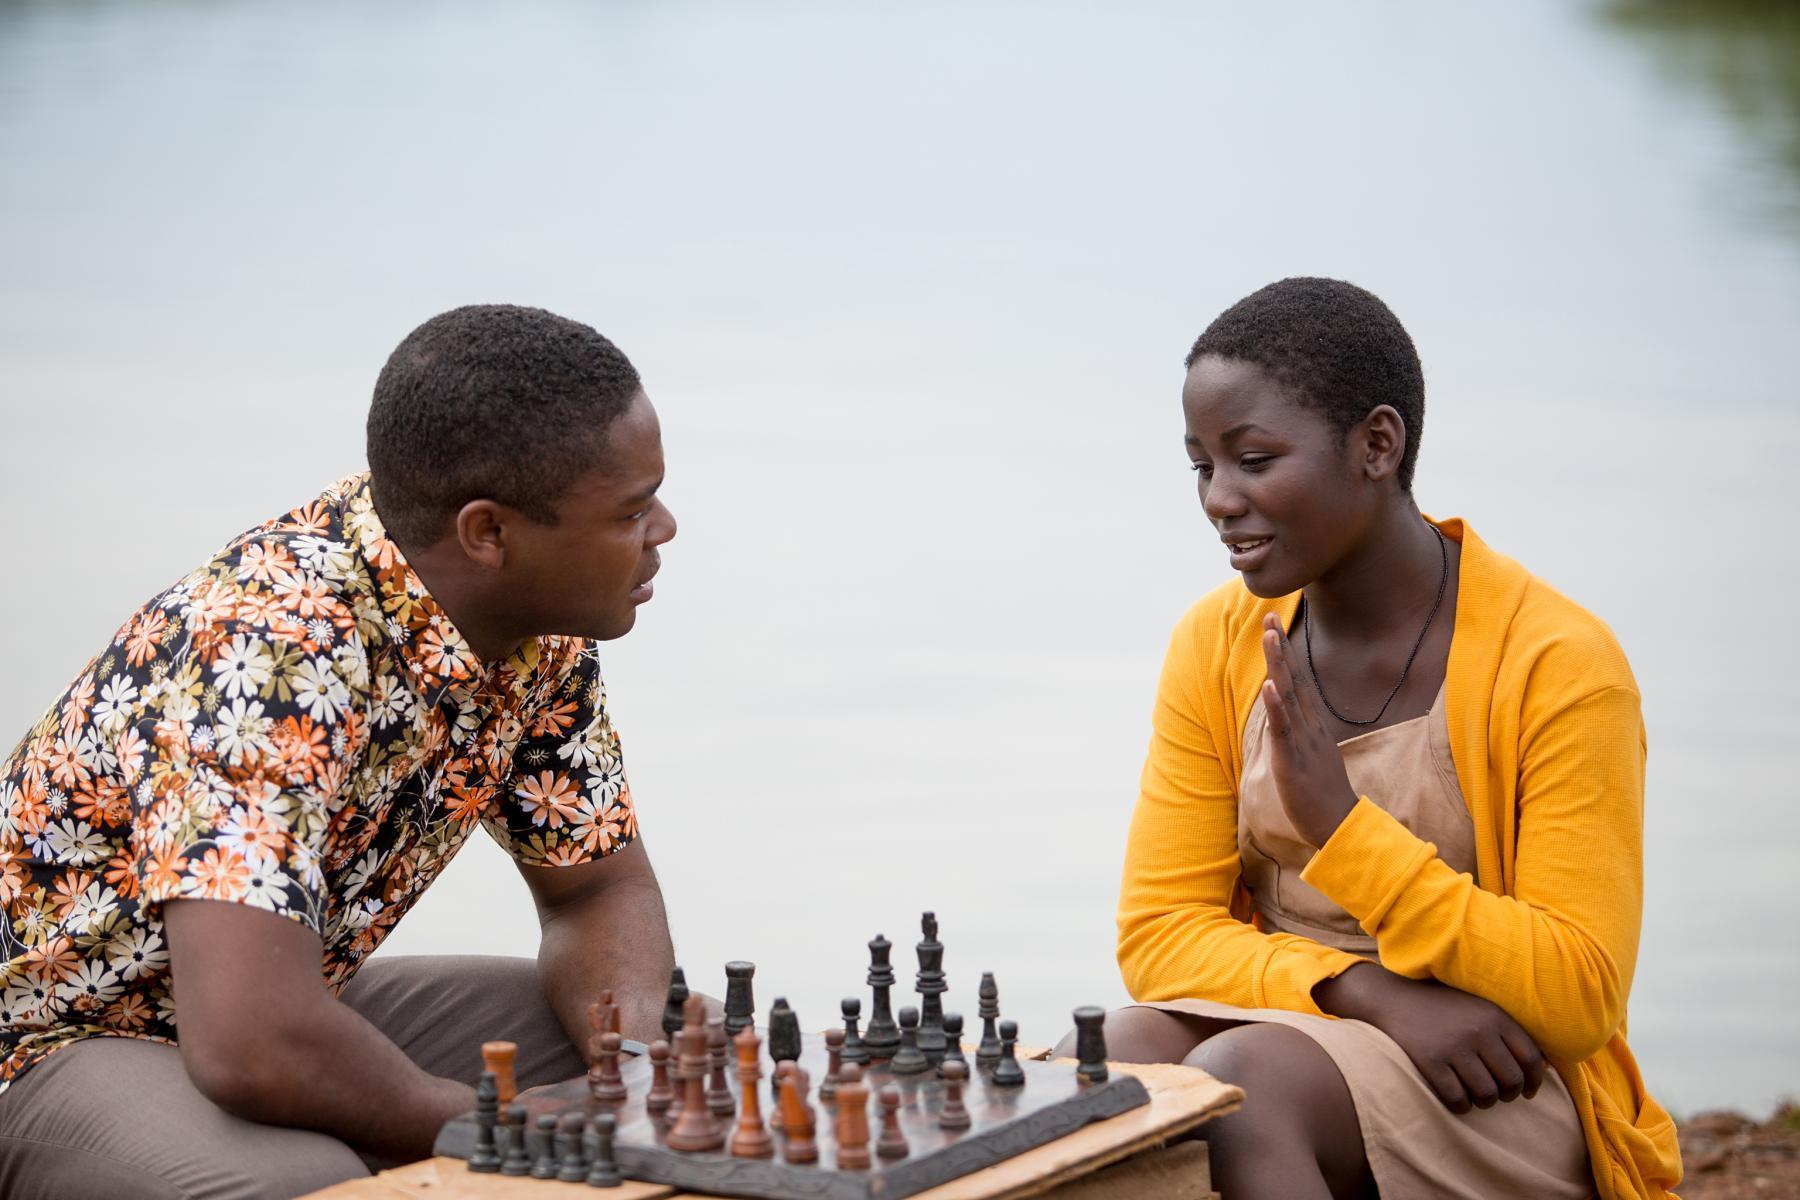 La reina de Katwe, dirigida por Mira Nair